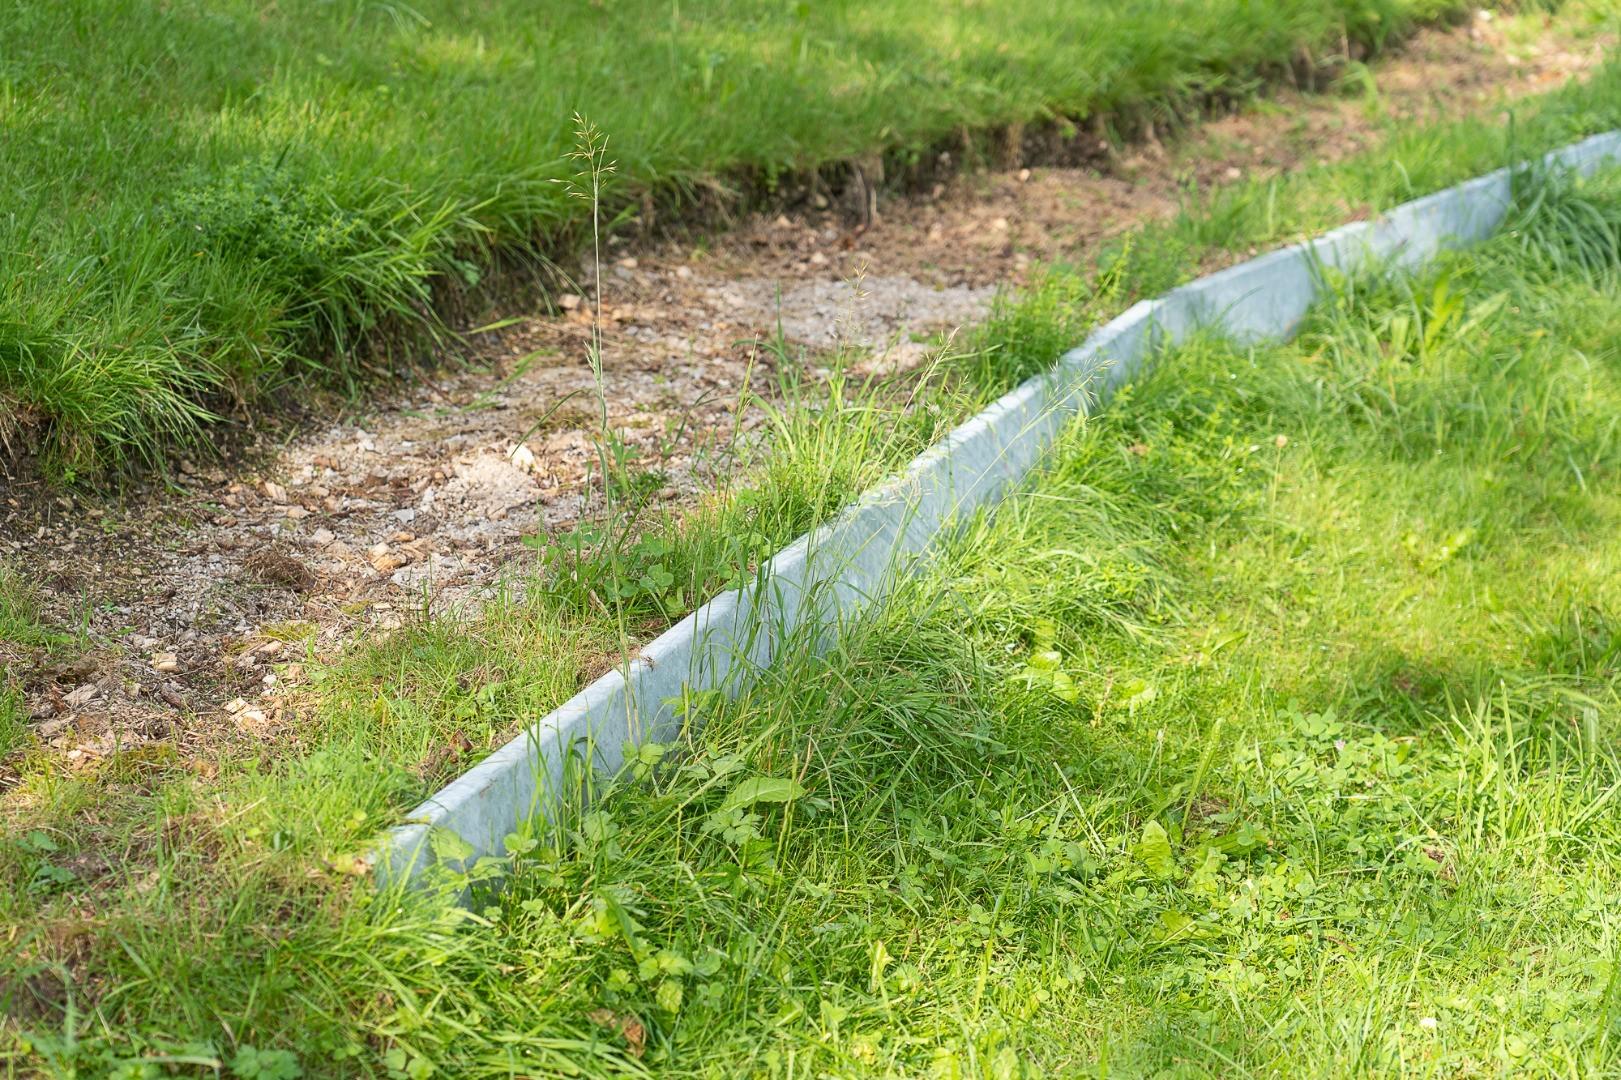 Hangsicherungsmodul Luchs im Garten